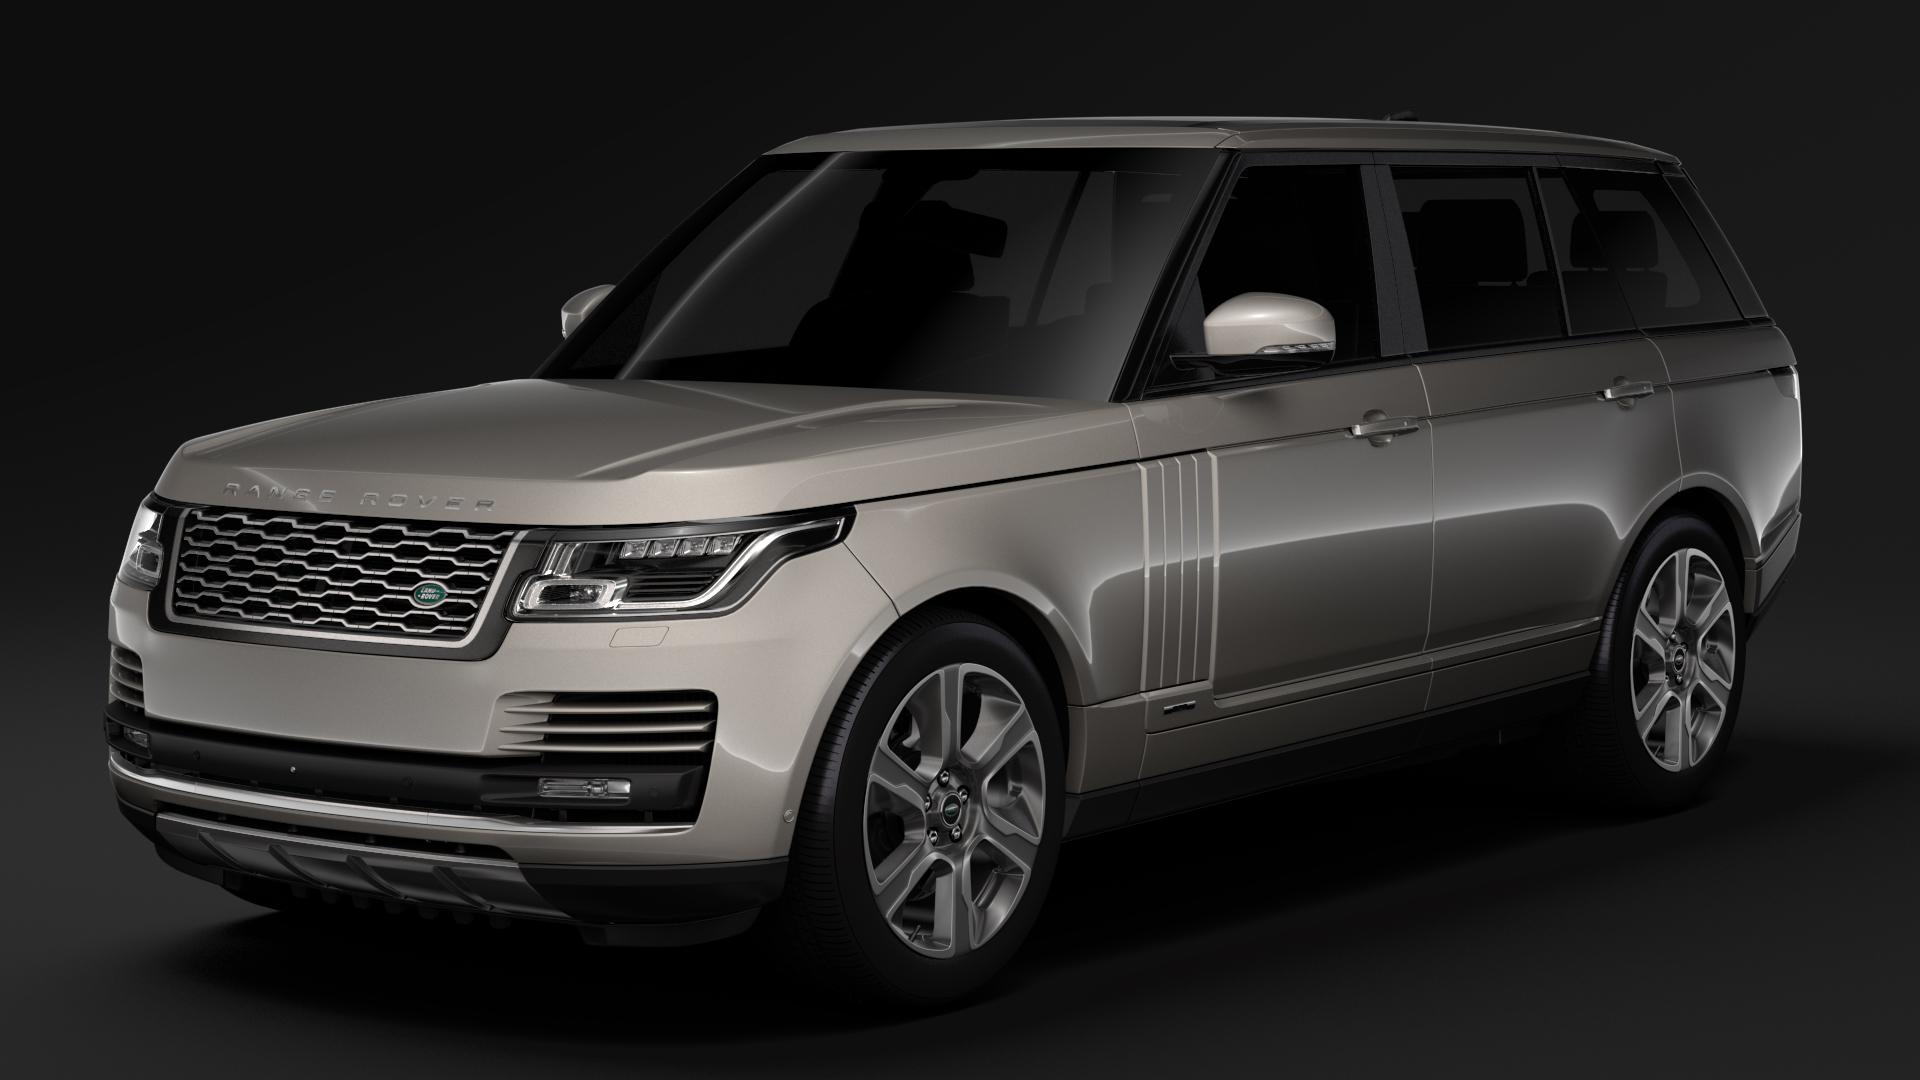 range rover hybrid lwb l405 2018 3d model max fbx c4d lwo ma mb hrc xsi obj 277417